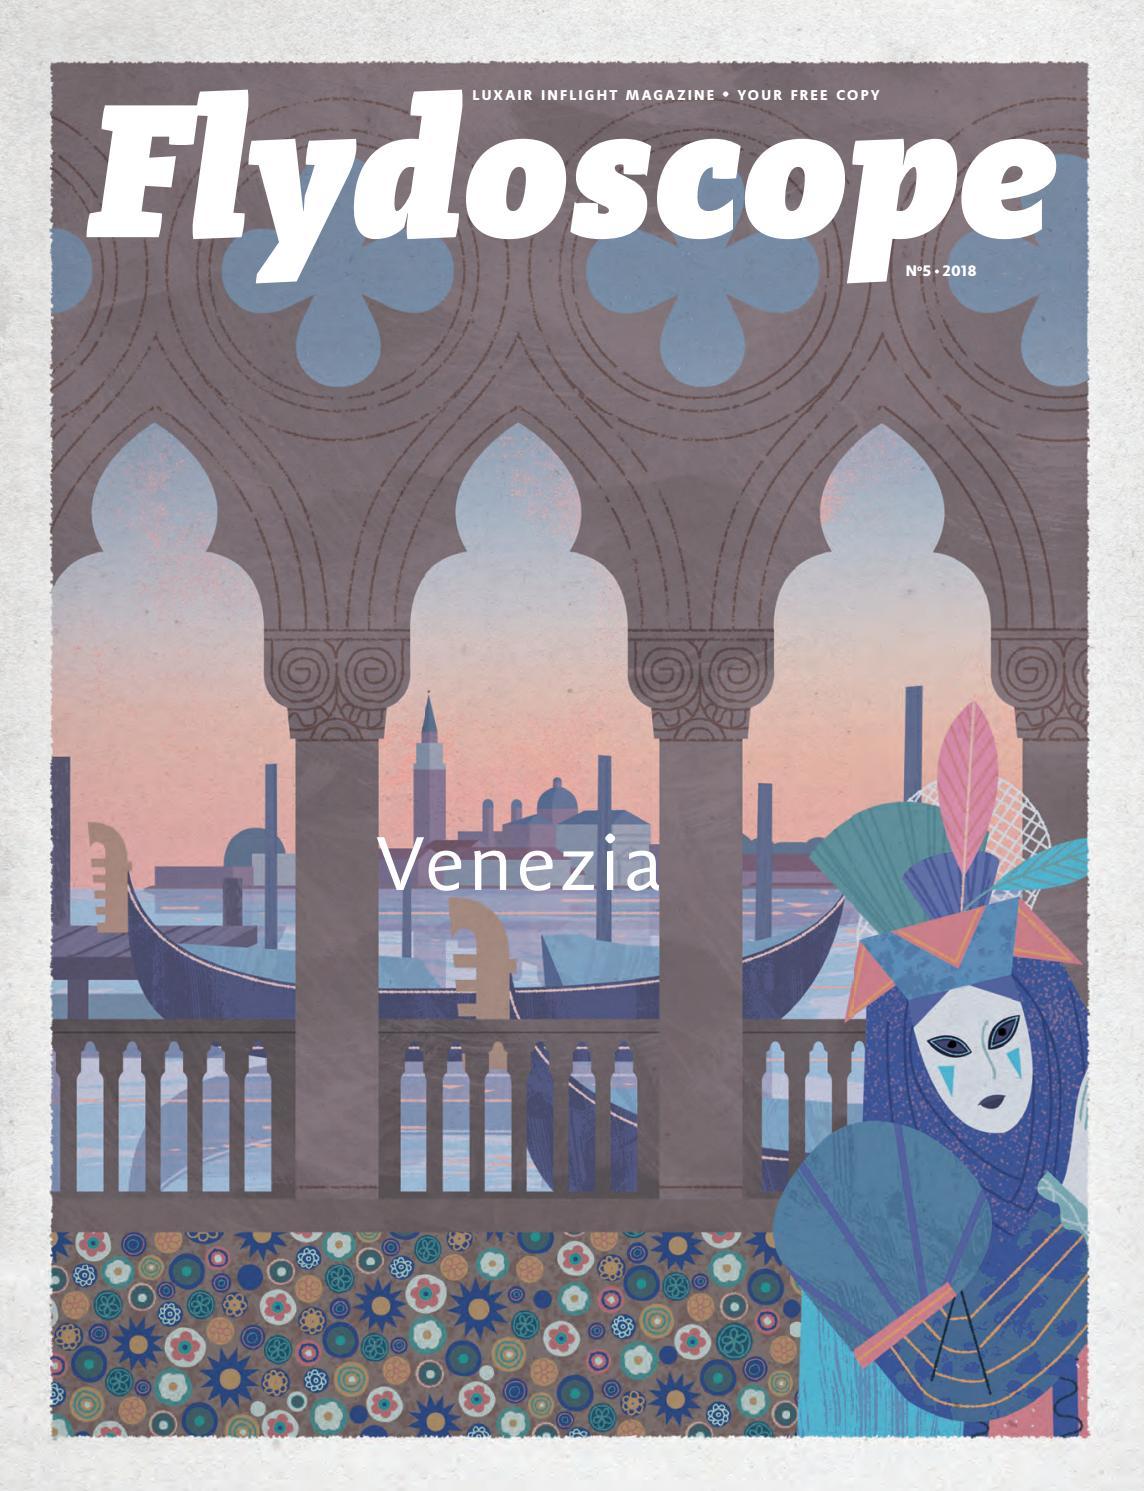 72e215a22a1619 Flydoscope 2018 N°5 by Maison Moderne - issuu